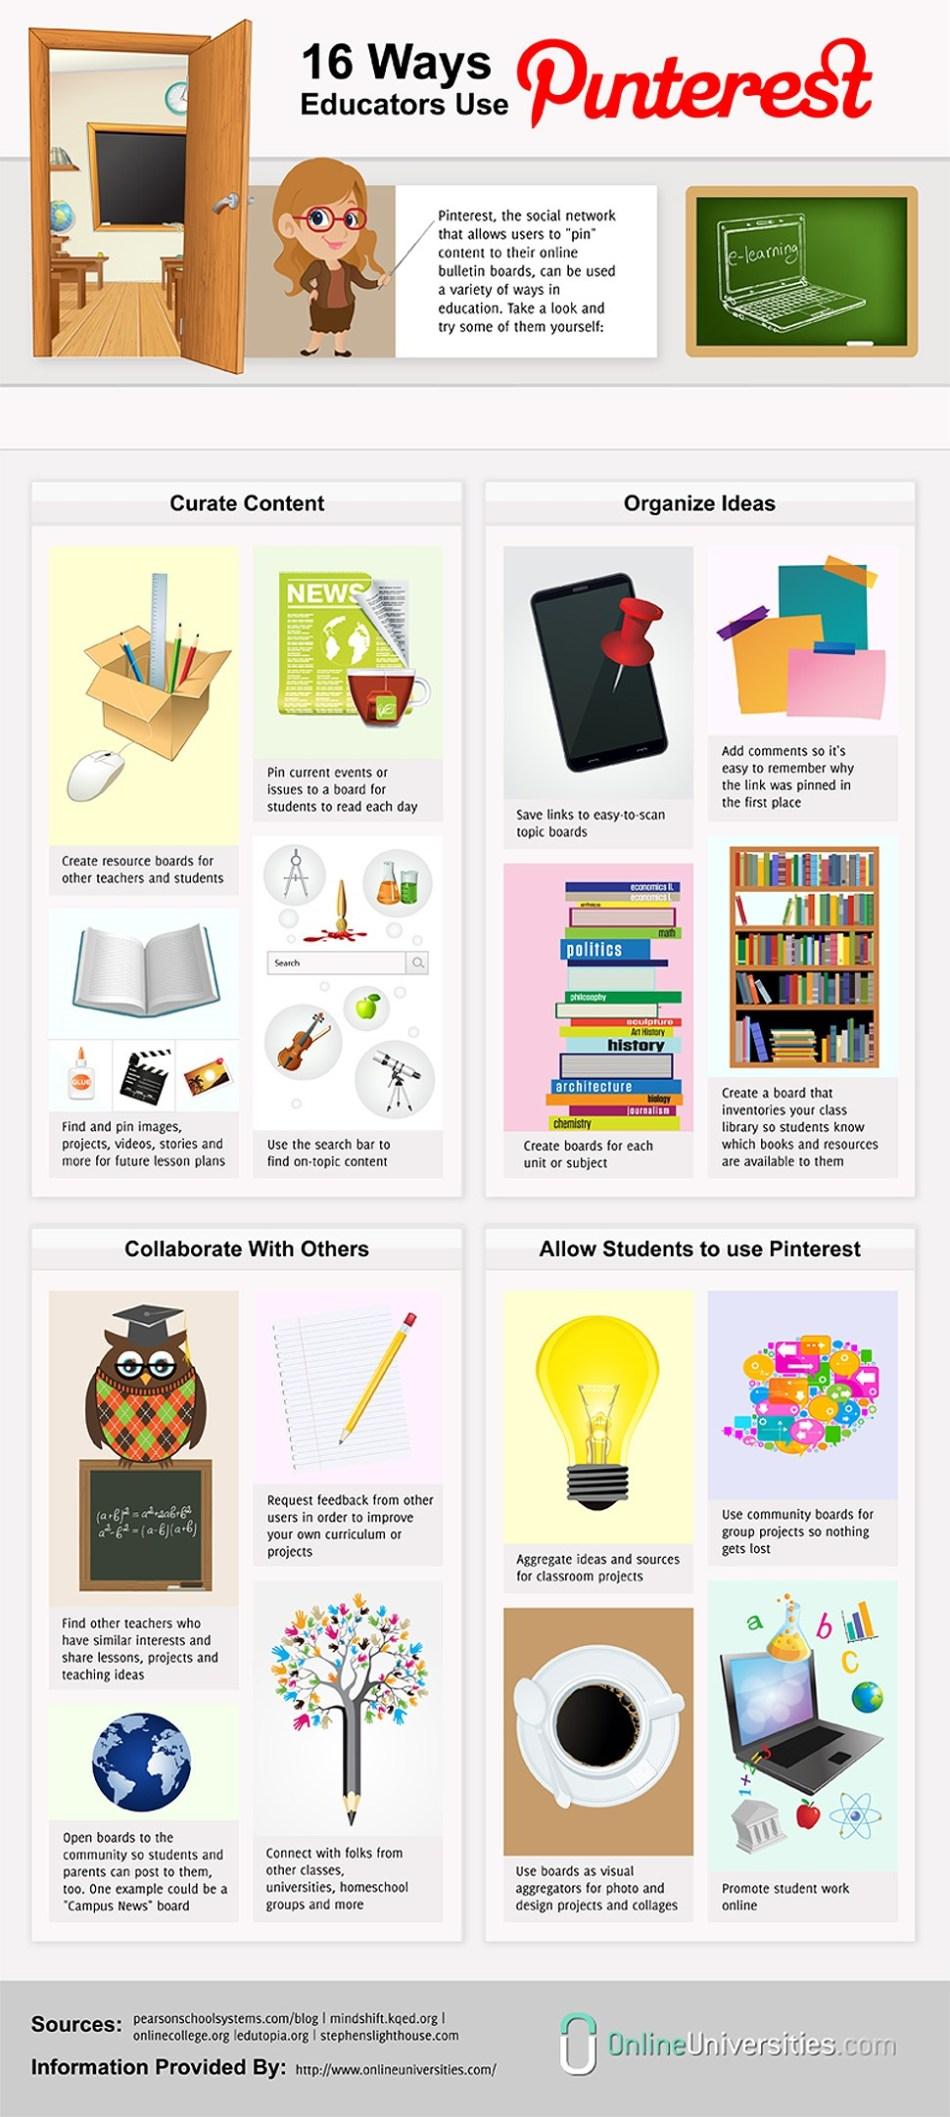 how educators use pinterest 16 Ways How Educators Use Pinterest [Infographic]